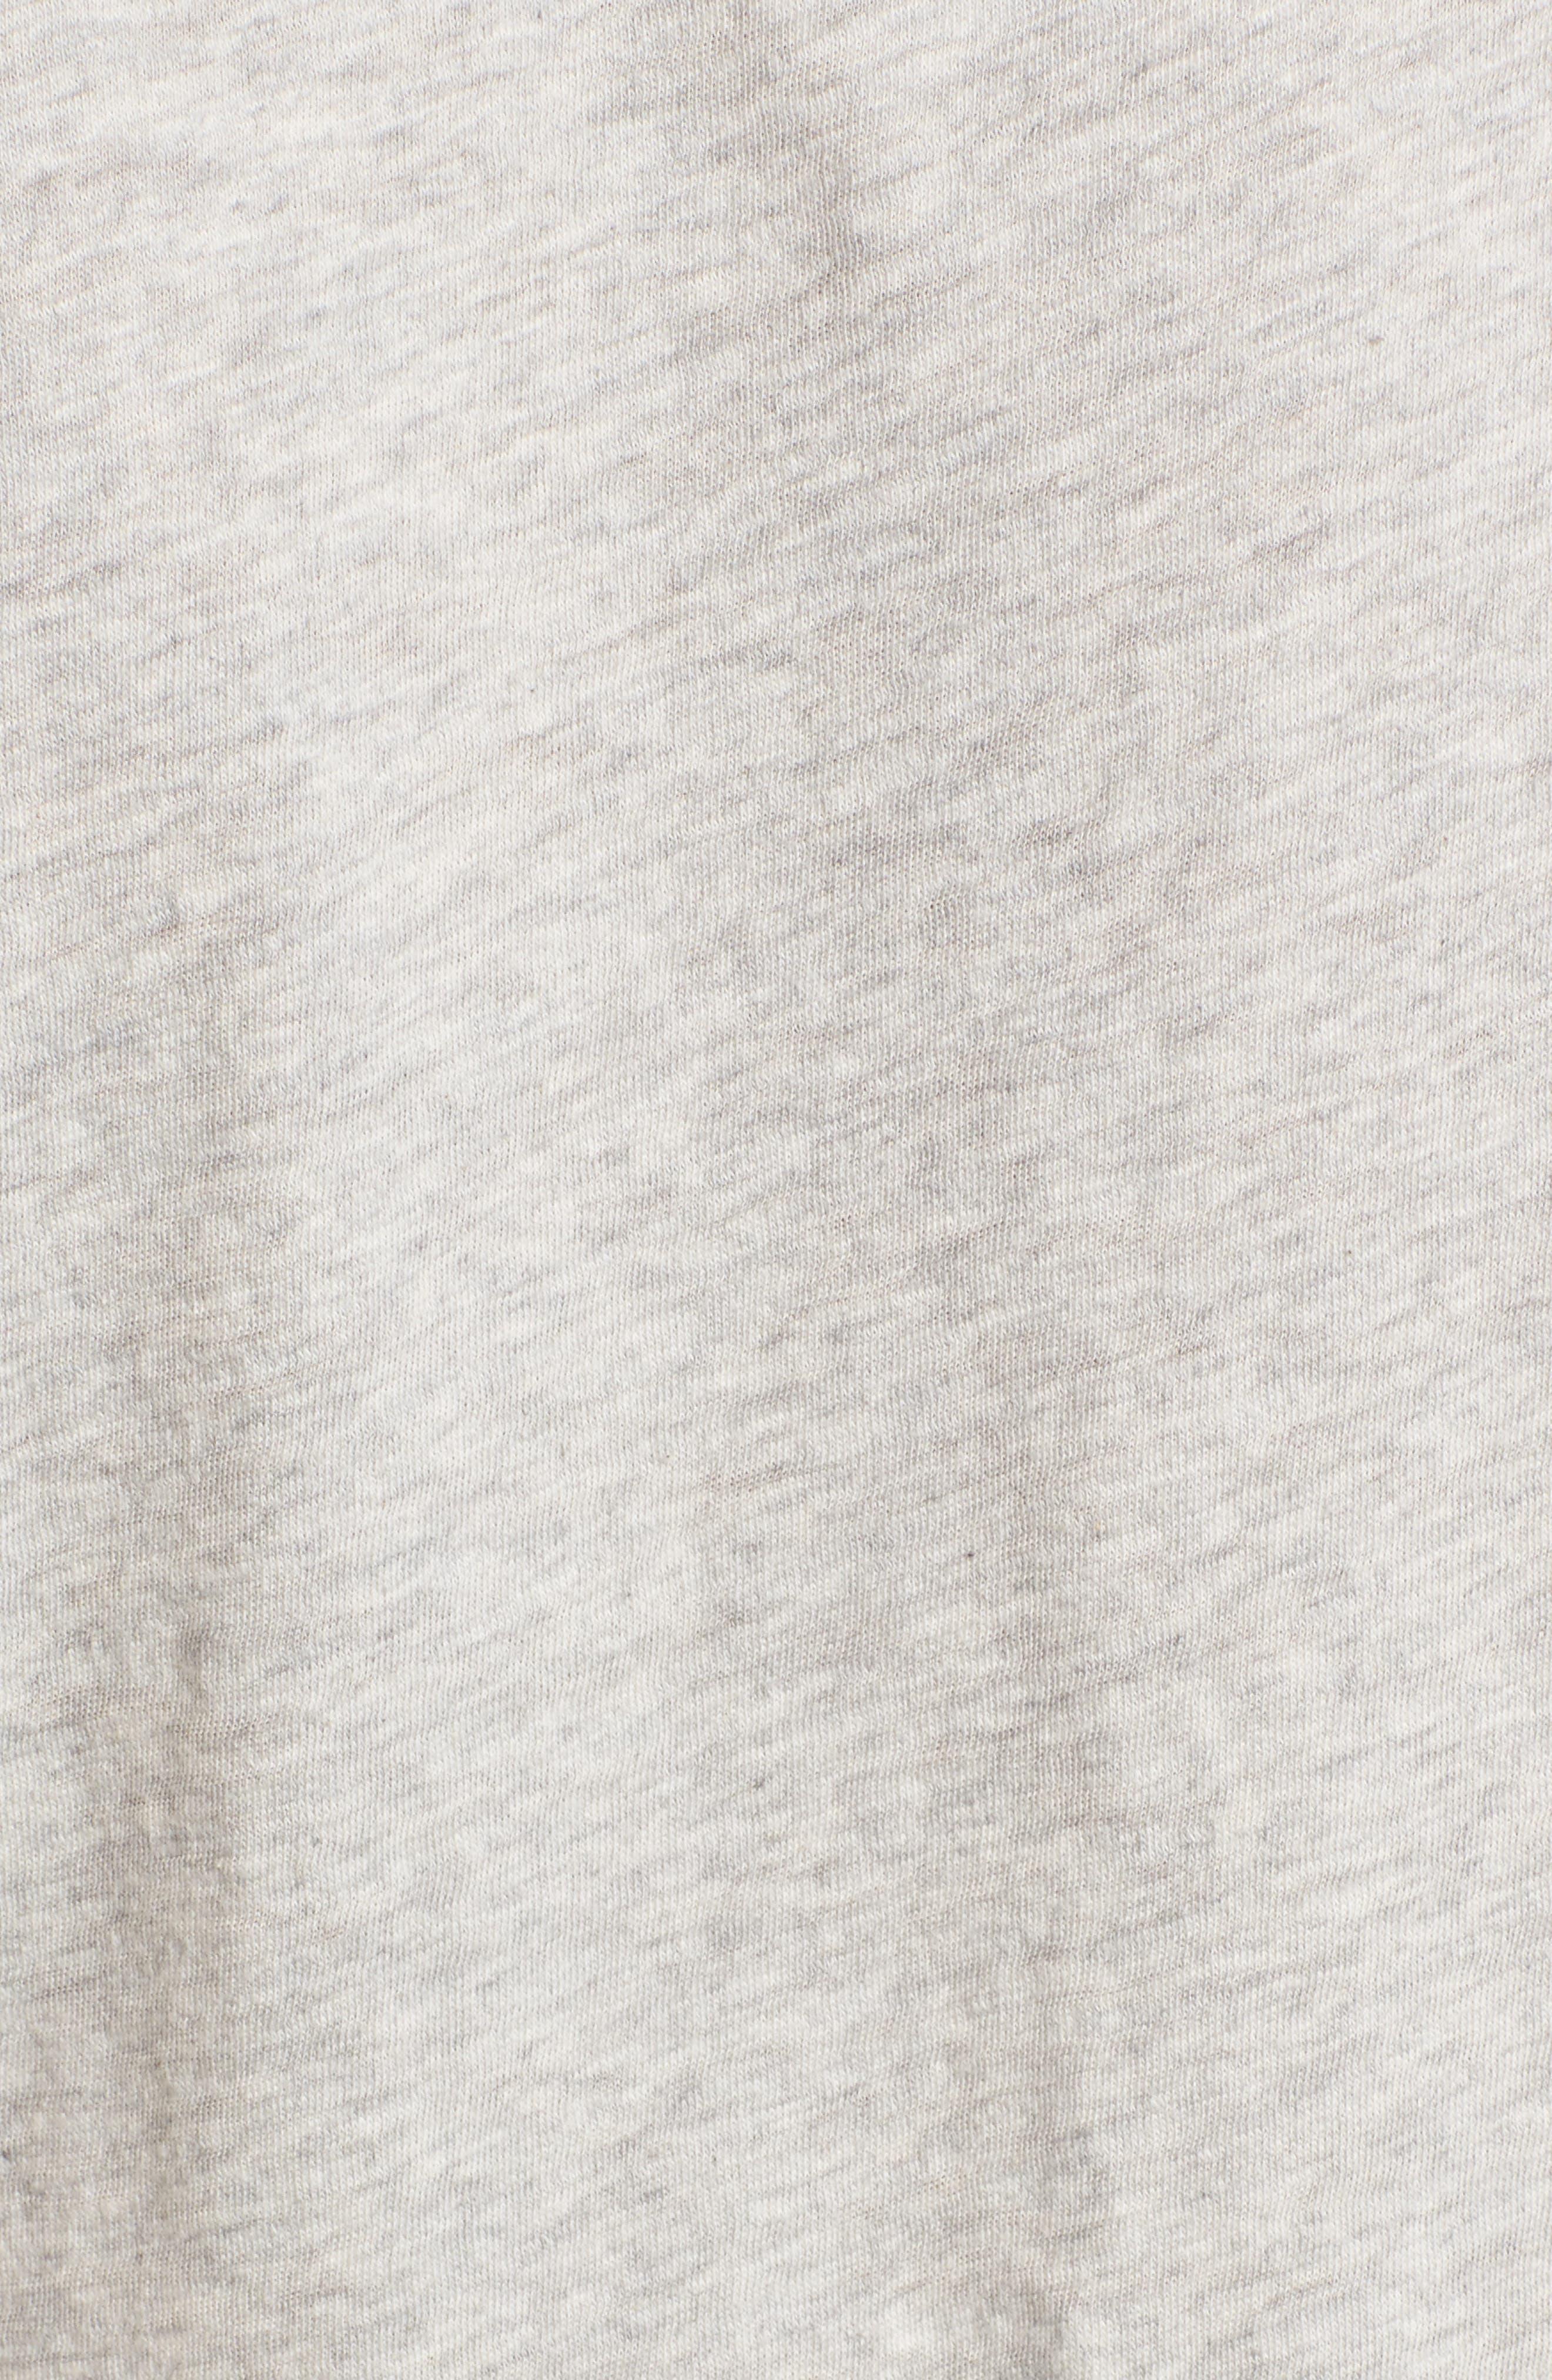 Pleat Sleeve Cotton Tee,                             Alternate thumbnail 22, color,